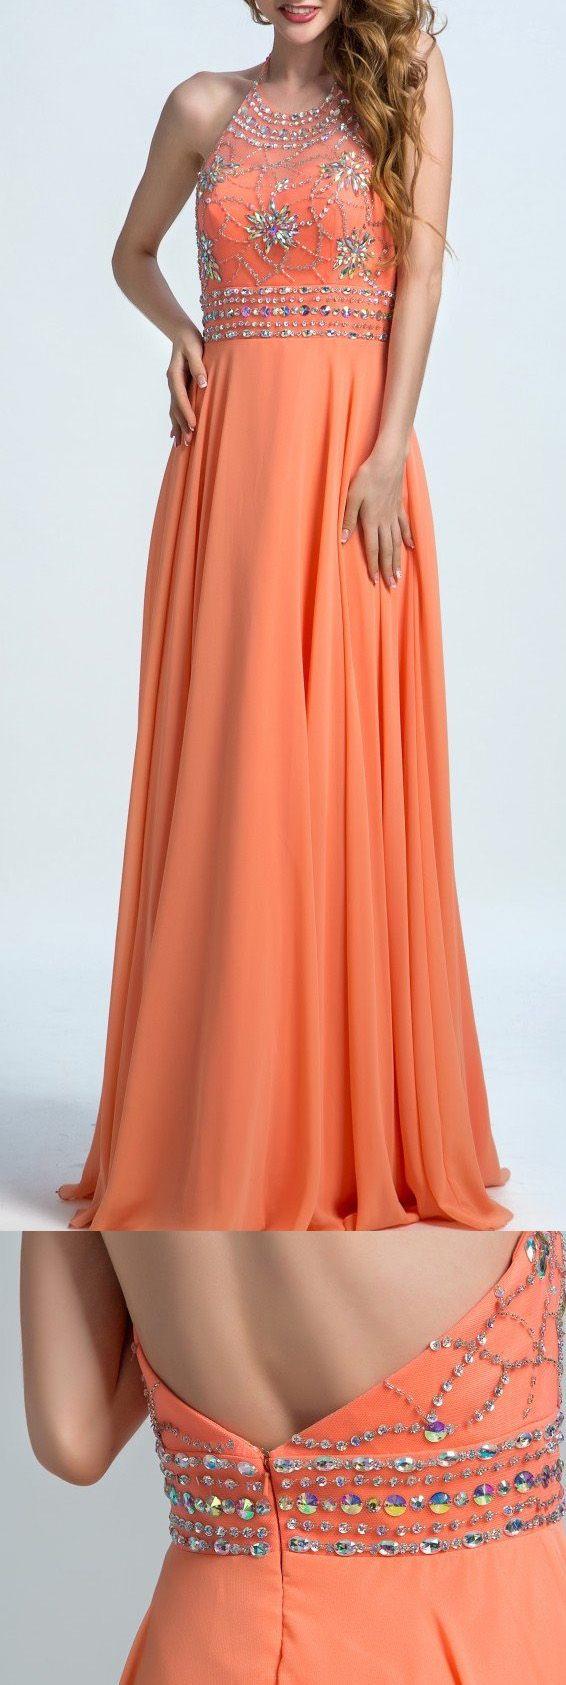 Long prom dresses coral prom dresses backless prom dresses